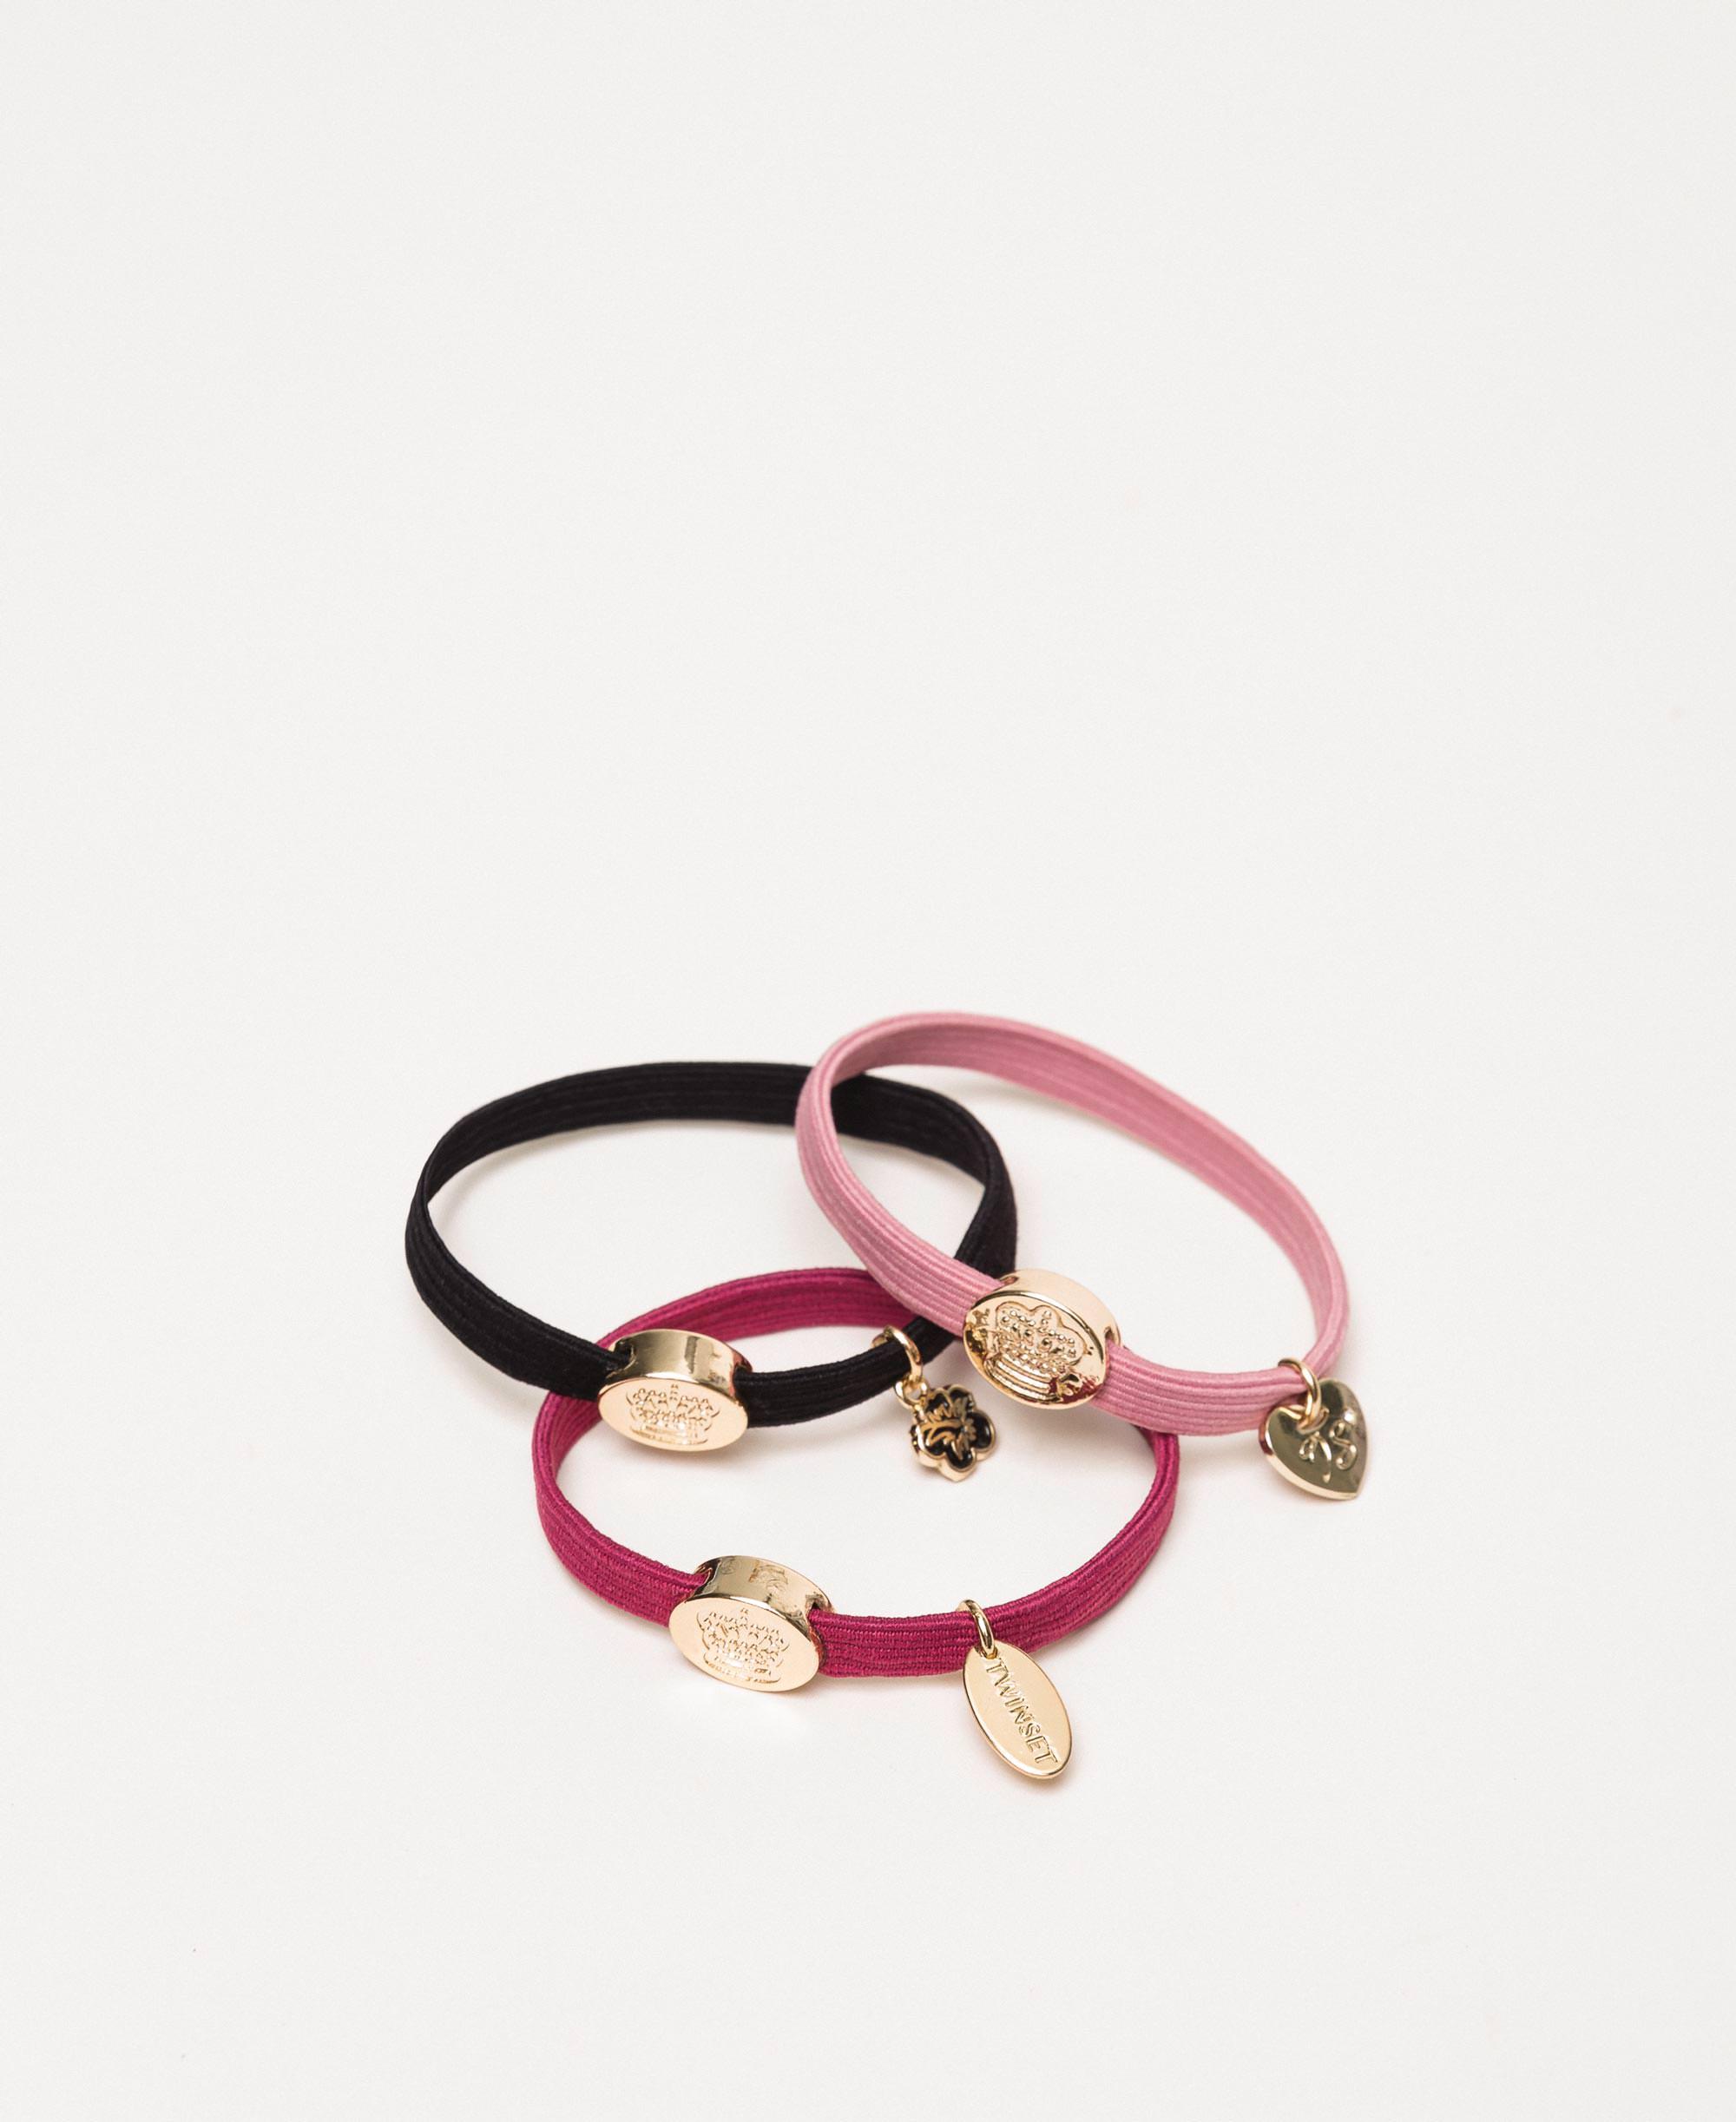 Ponytail Holder Bracelets With Logo